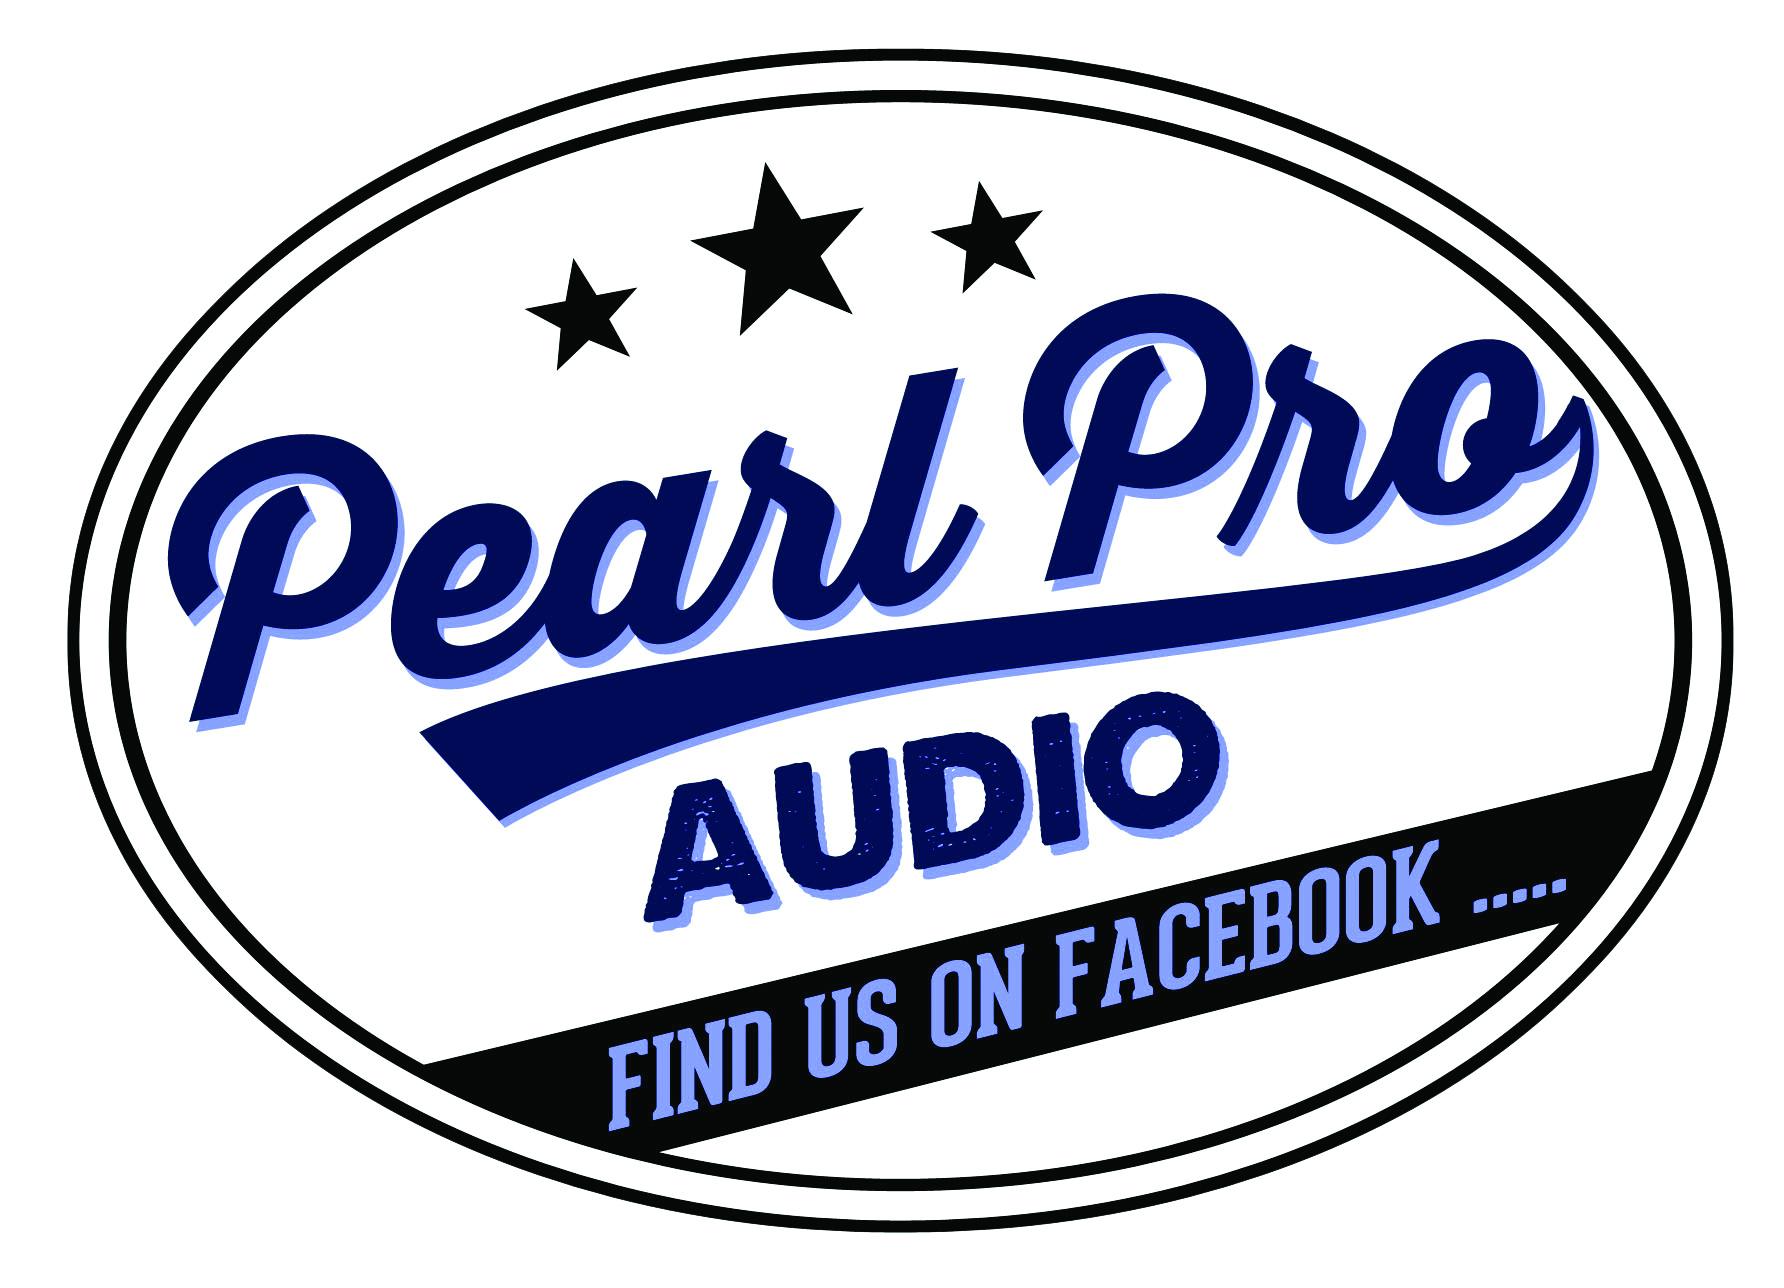 pearl_pro_audio_white background.jpg